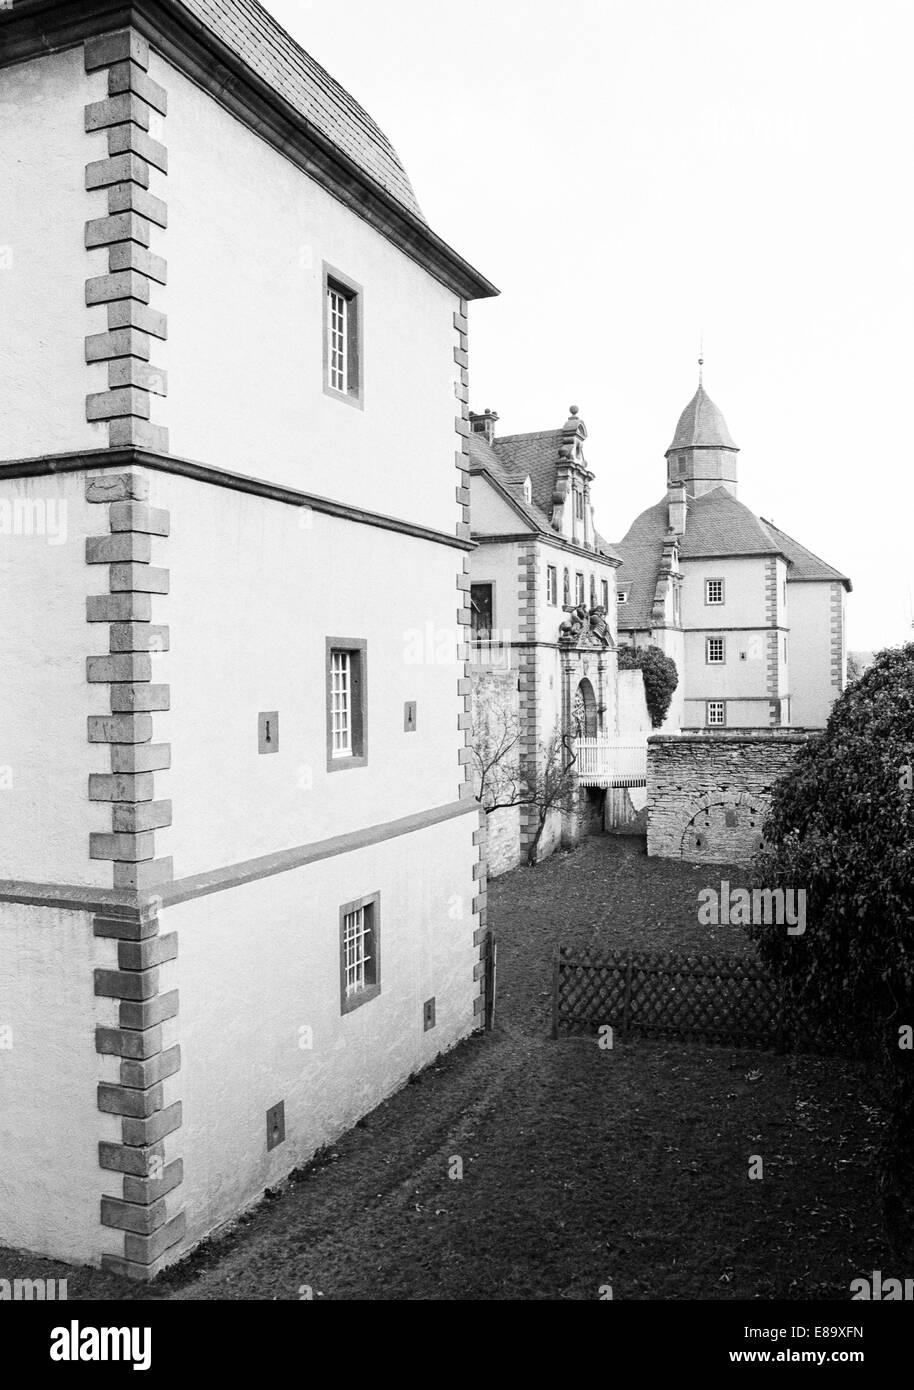 Achtziger Jahre, Barockschloss Eringerfeld in Geseke-Eringerfeld, Ostwestfalen, Nordrhein-Westfalen - Stock Image